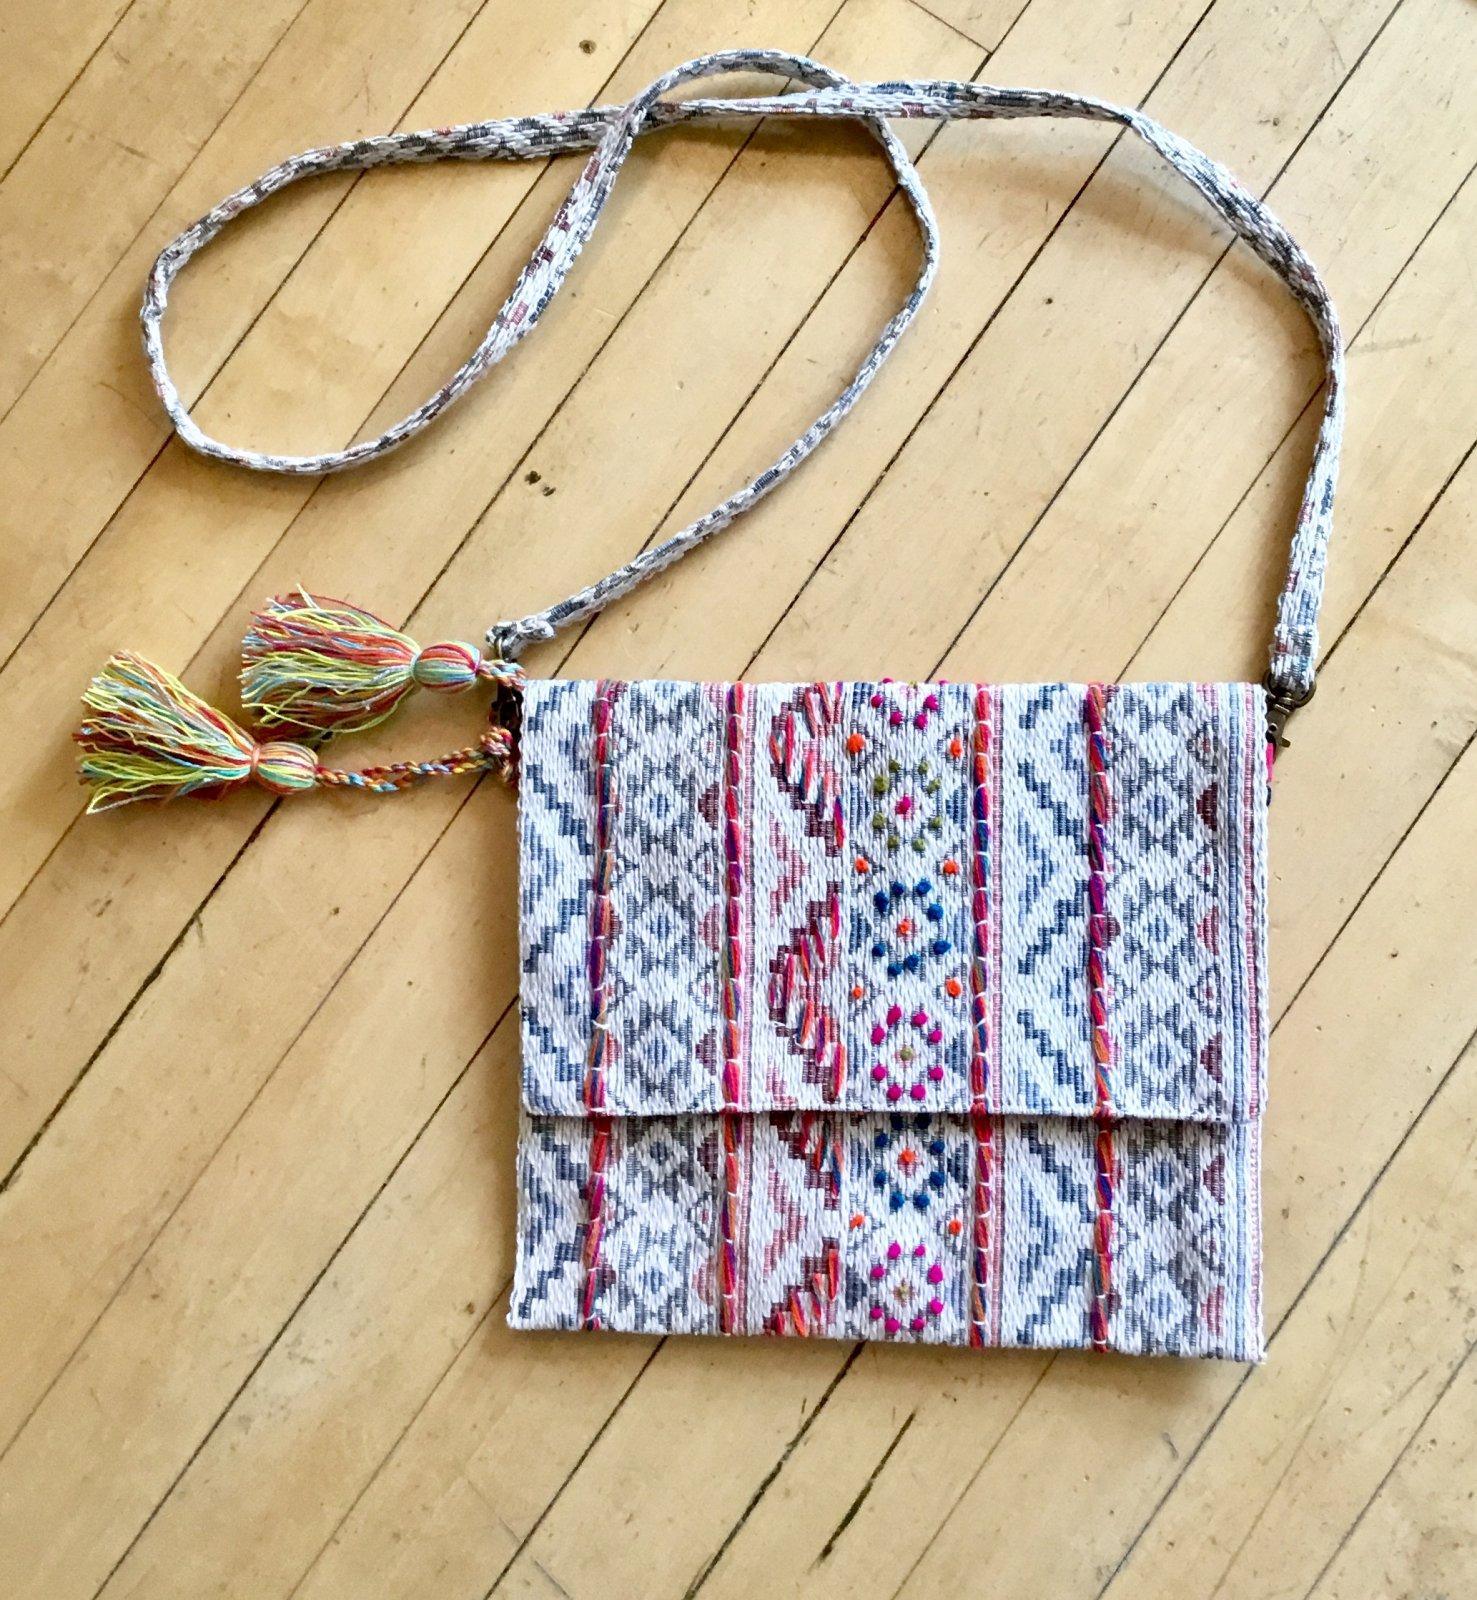 Chloe & Lex Handbag w/flap